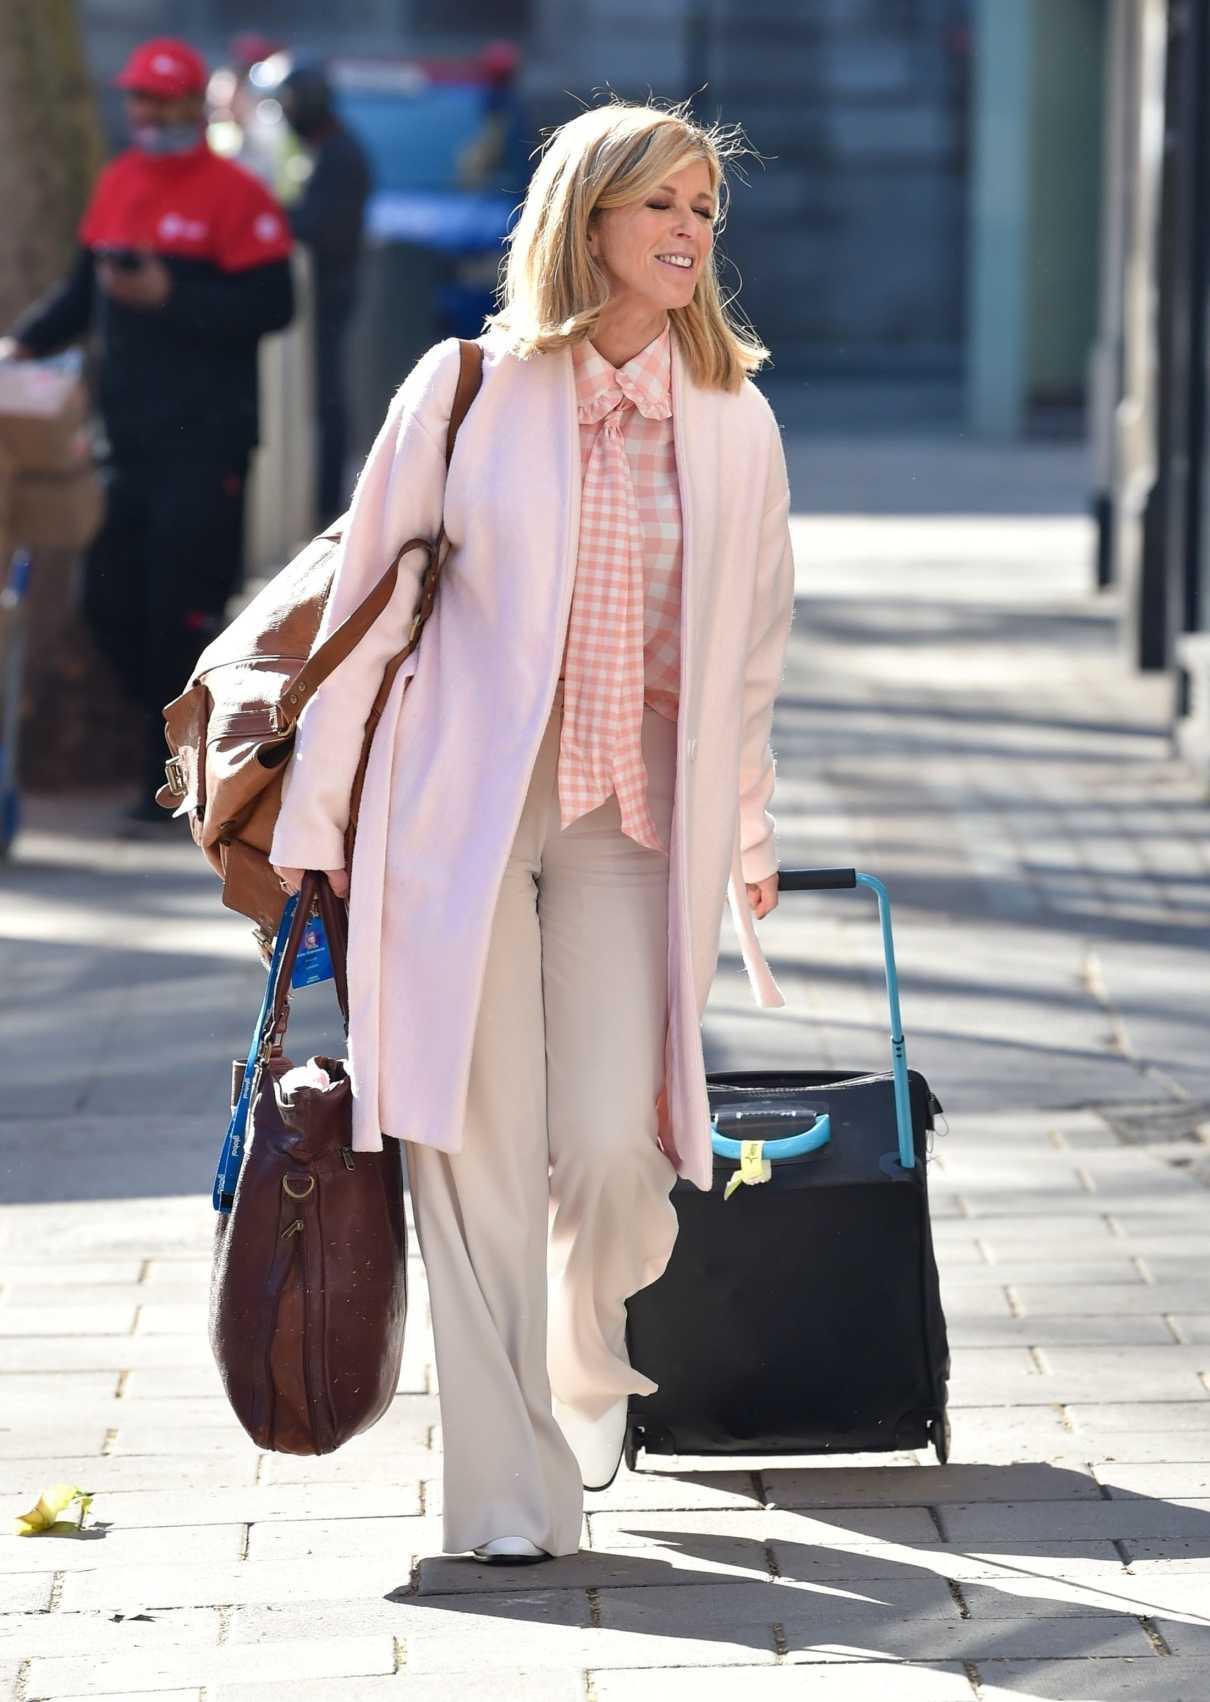 Kate Garraway in a Pink Cardigan